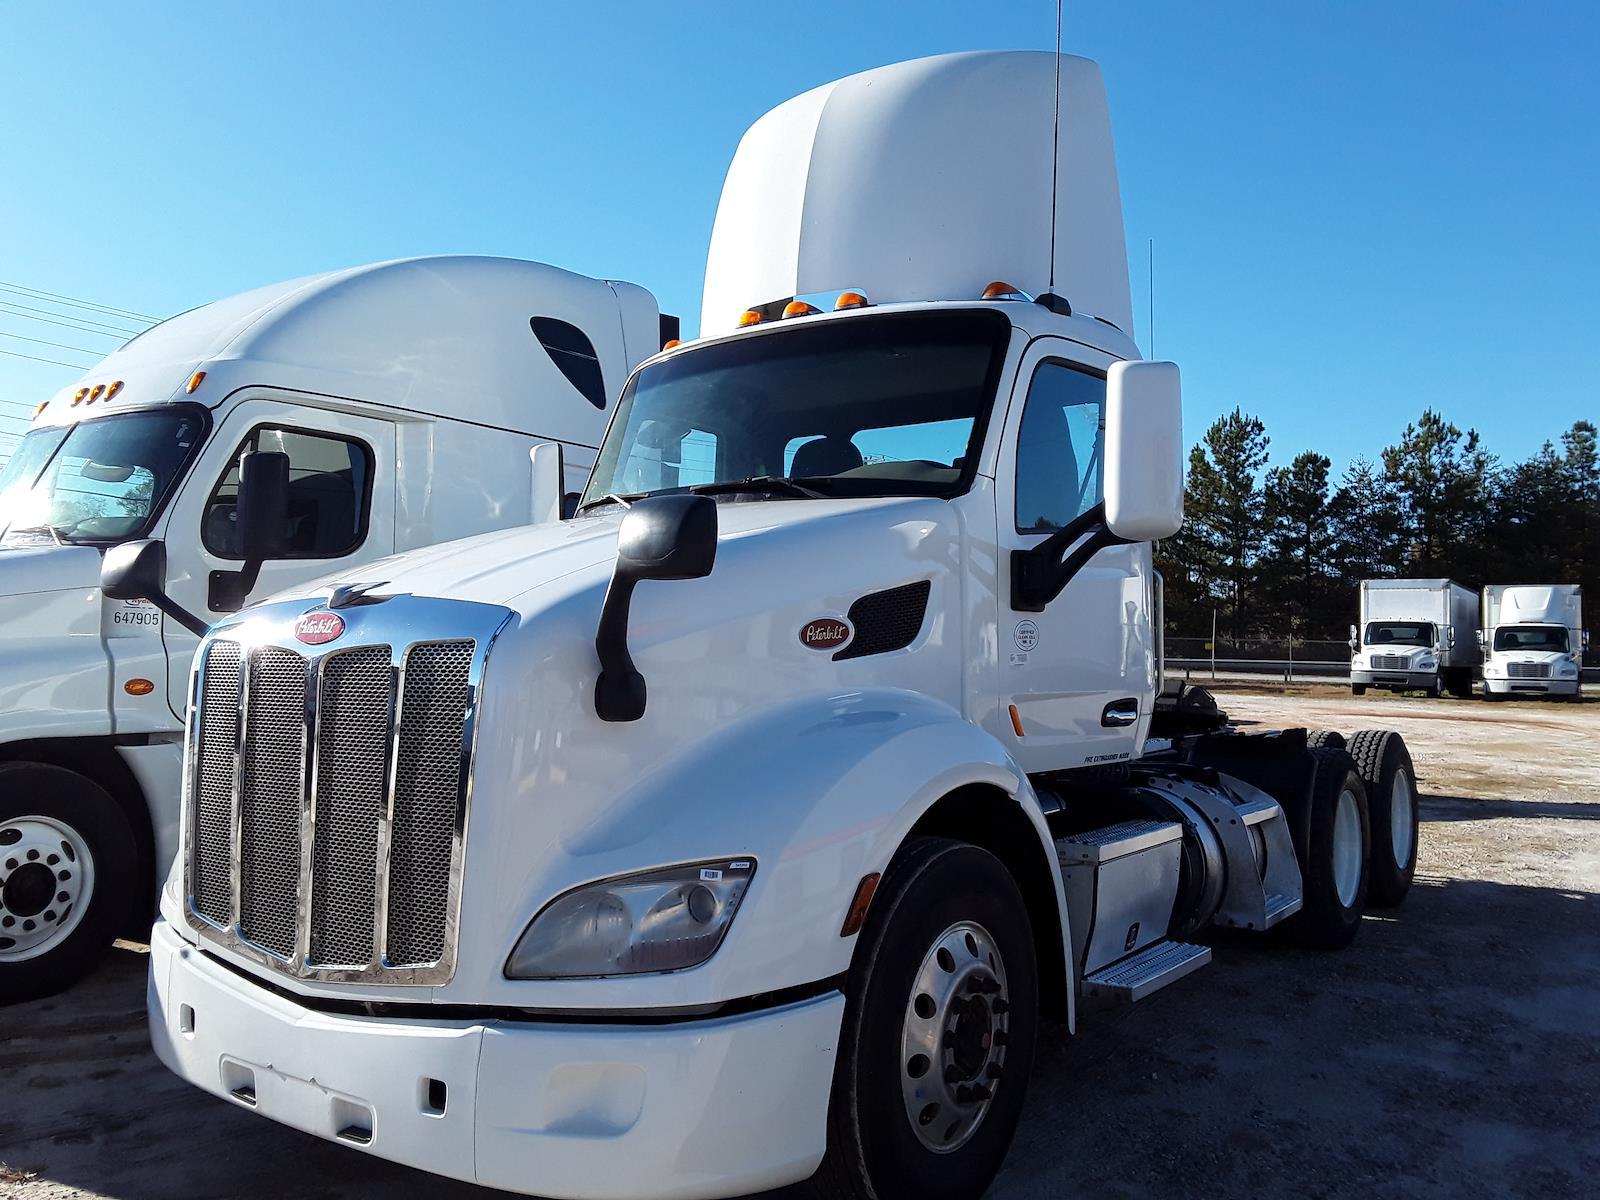 2015 Peterbilt 579 6x4, Tractor #343350 - photo 1